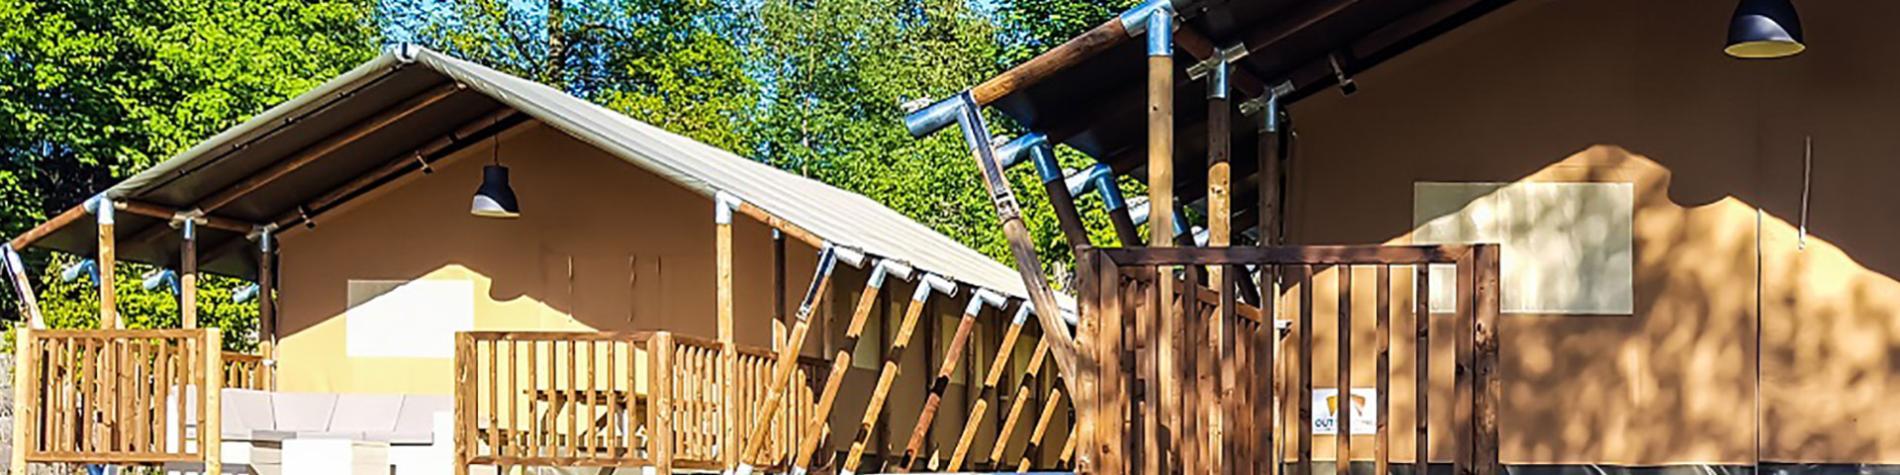 Camping en Wallonie - camp - campement - naturisme